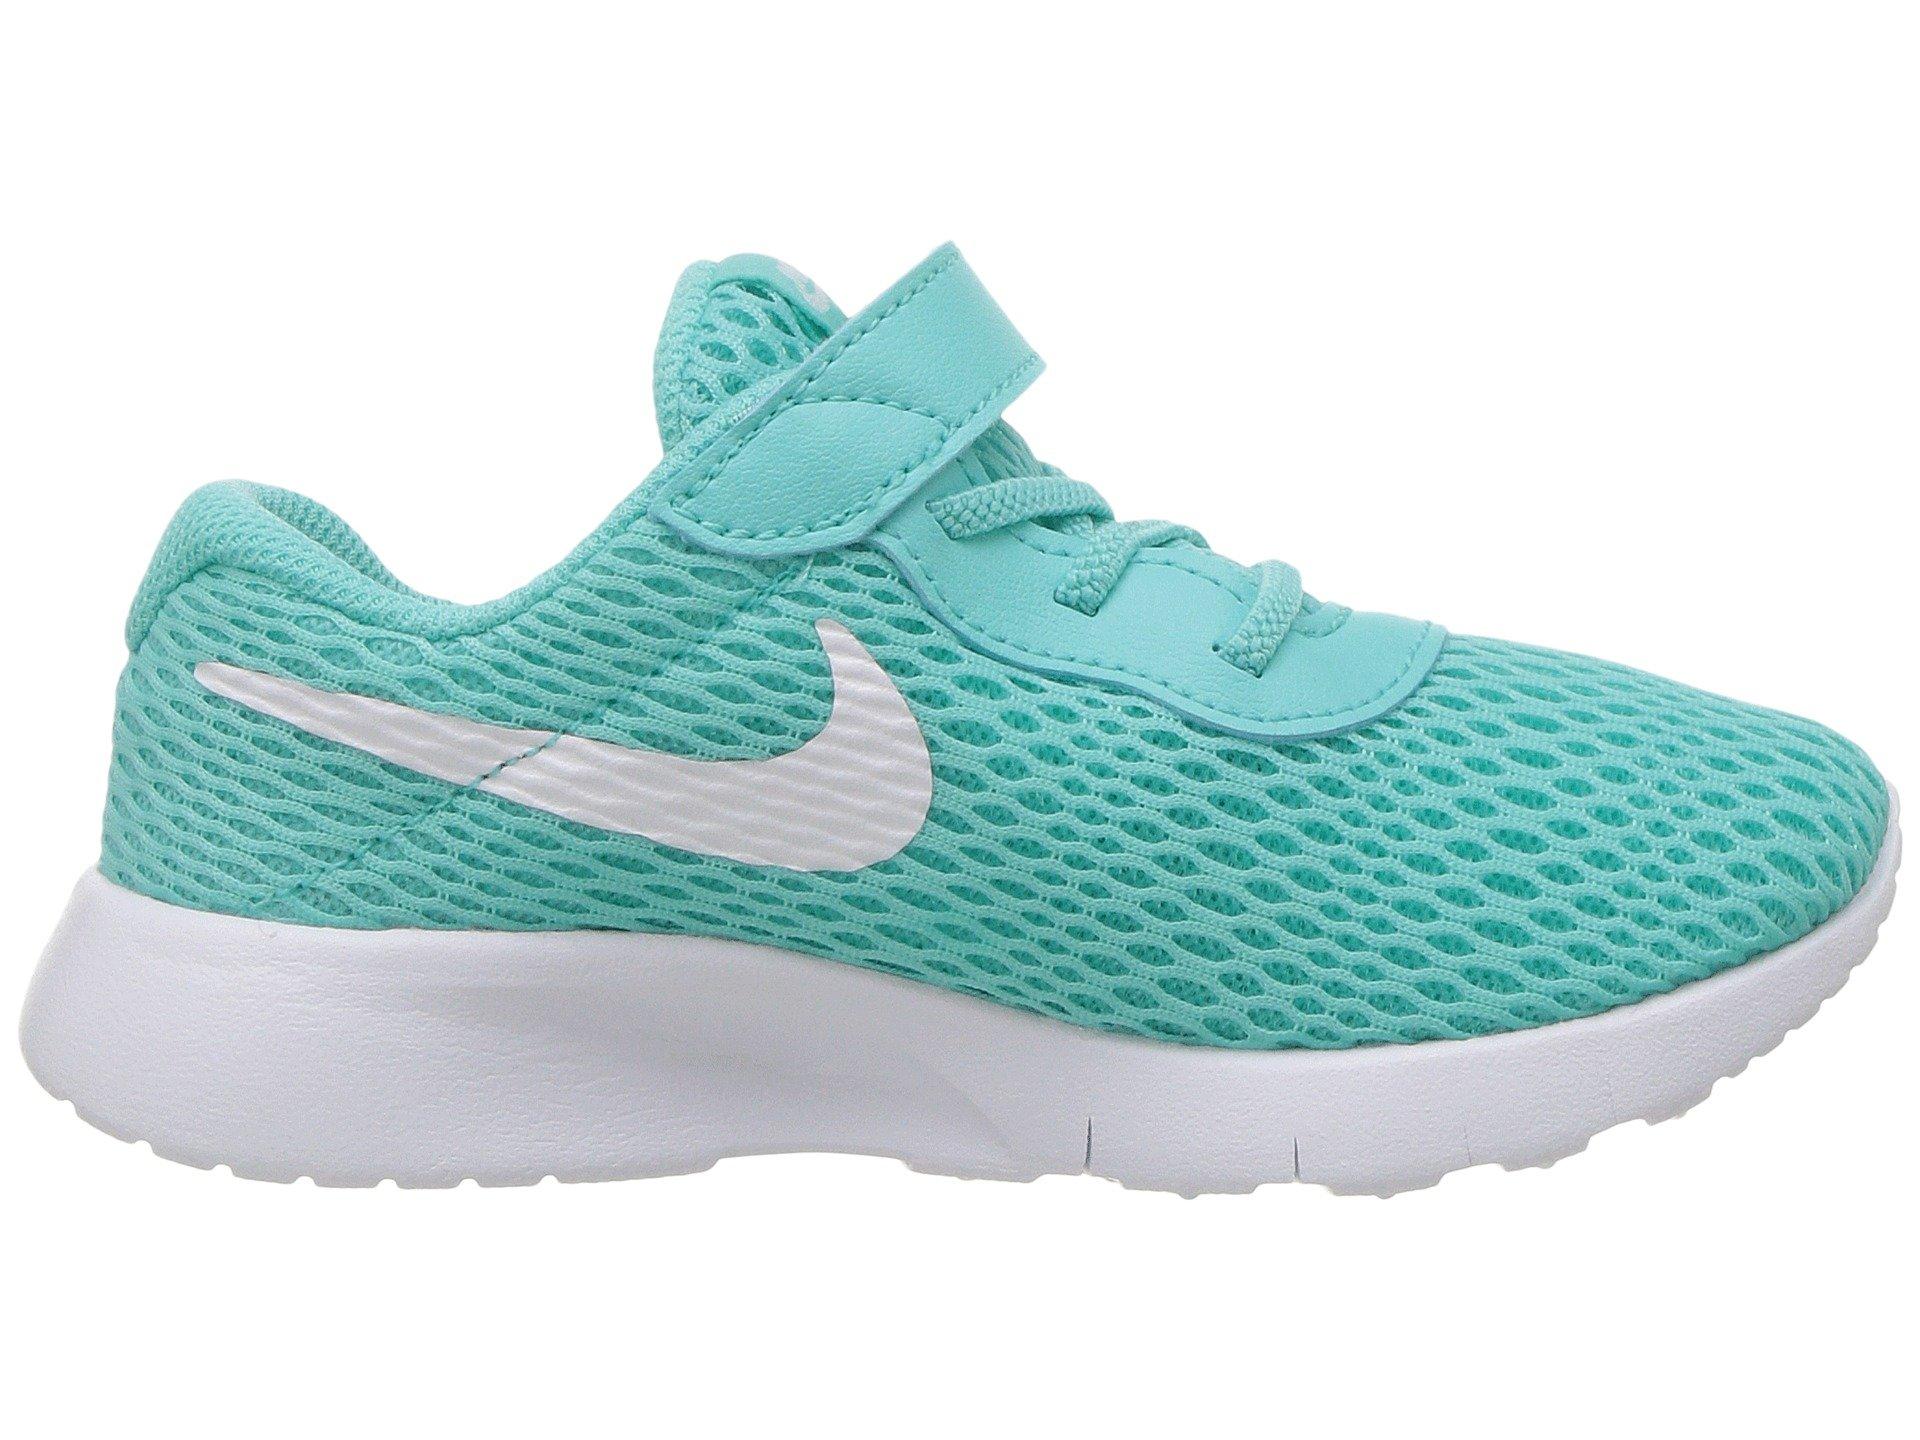 Nike Free Run High Cut | EzCatDB